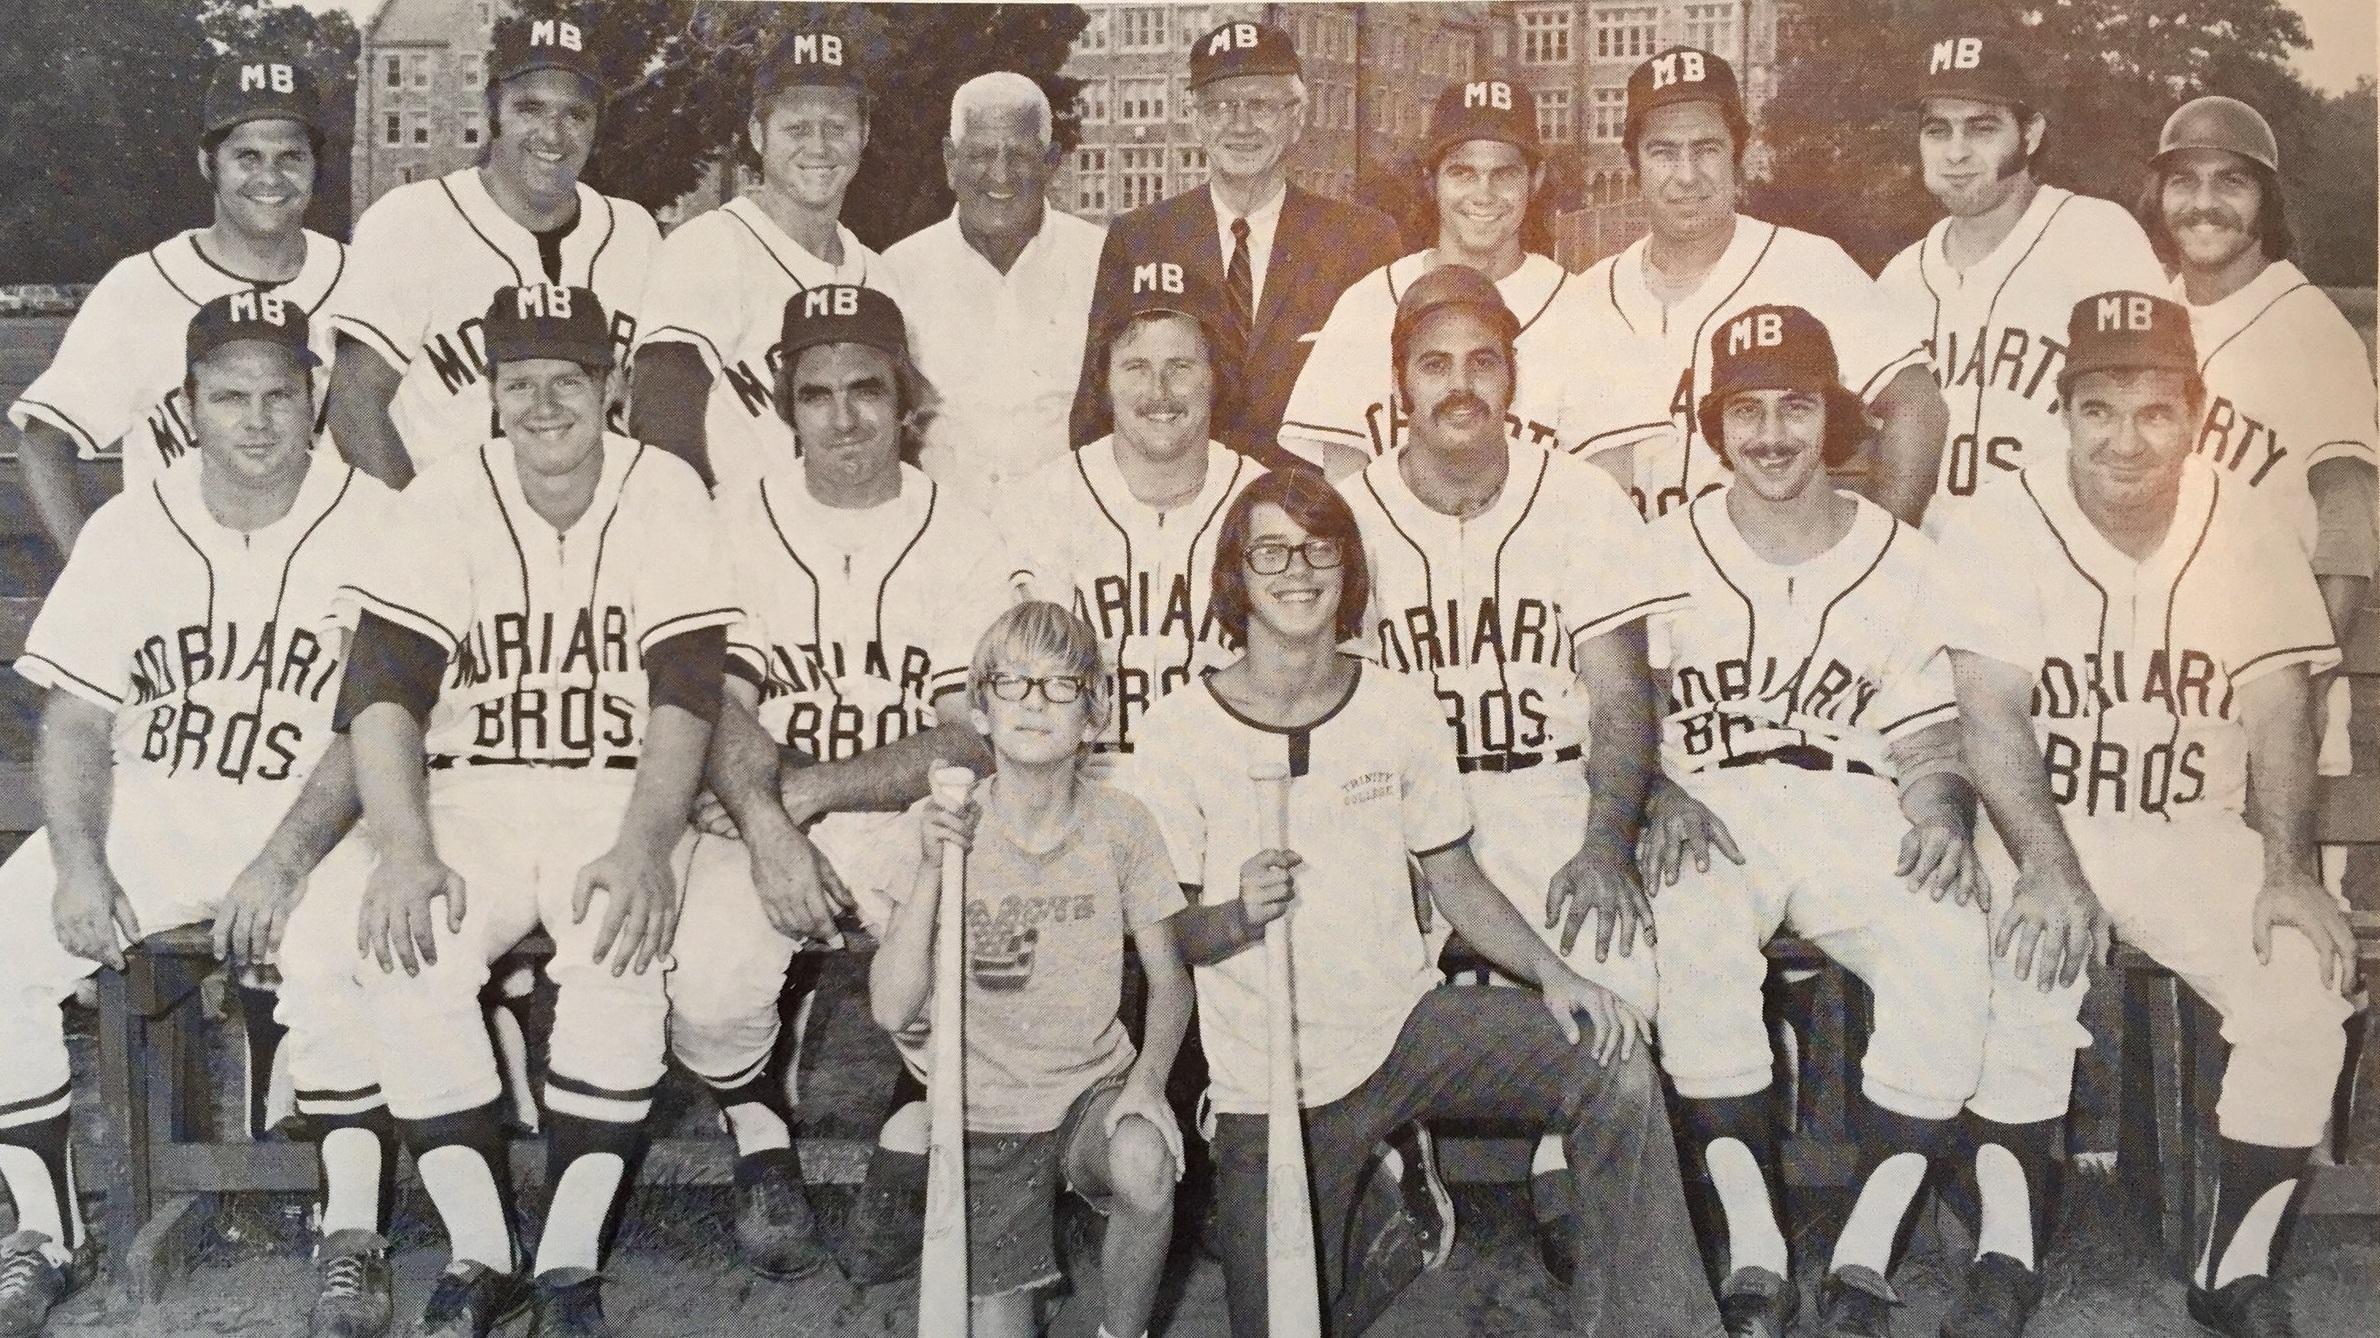 1970+Moriarty+Brothers+Hartford+Twilight+Baseball.jpg